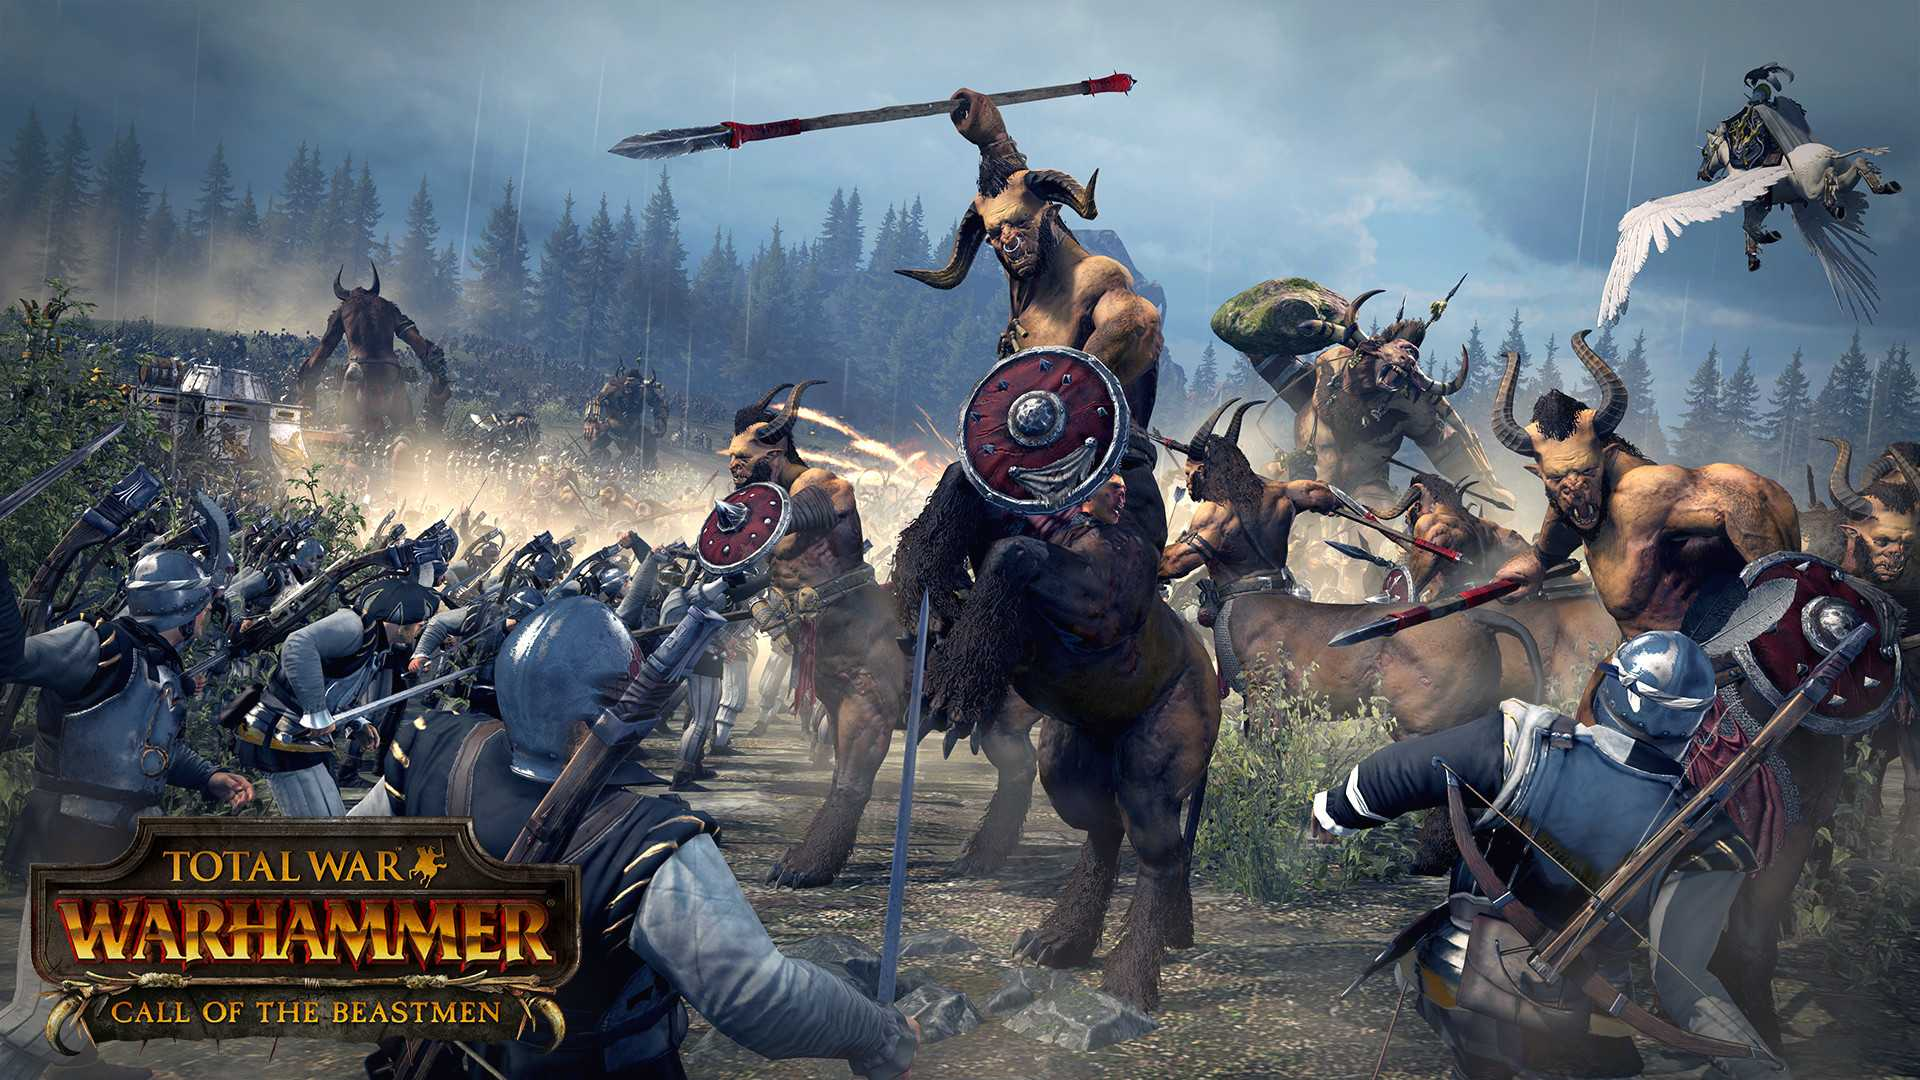 Купить Total War: Warhammer — Call of the Beastmen дешево